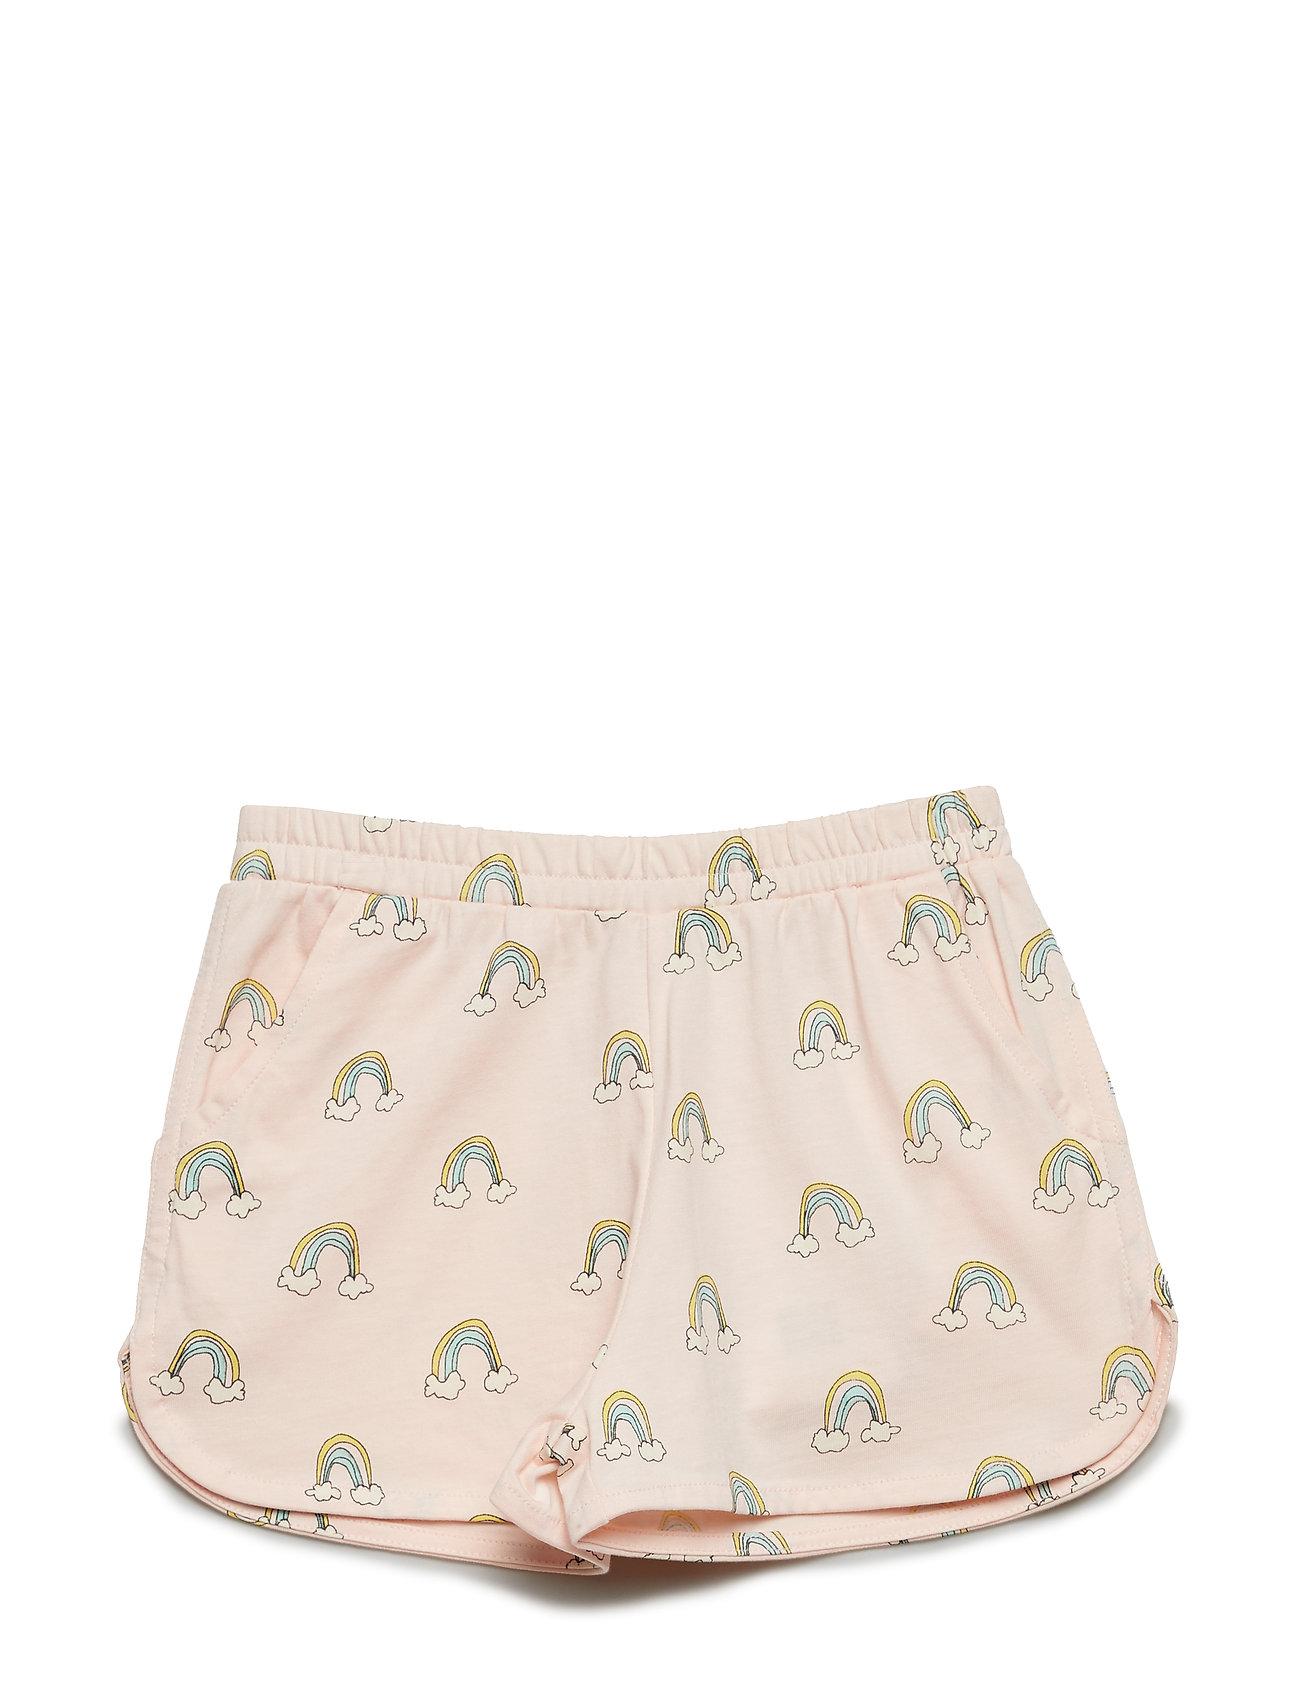 Soft Gallery Paris Shorts - PALE DOGWOOD, AOP LUCKY